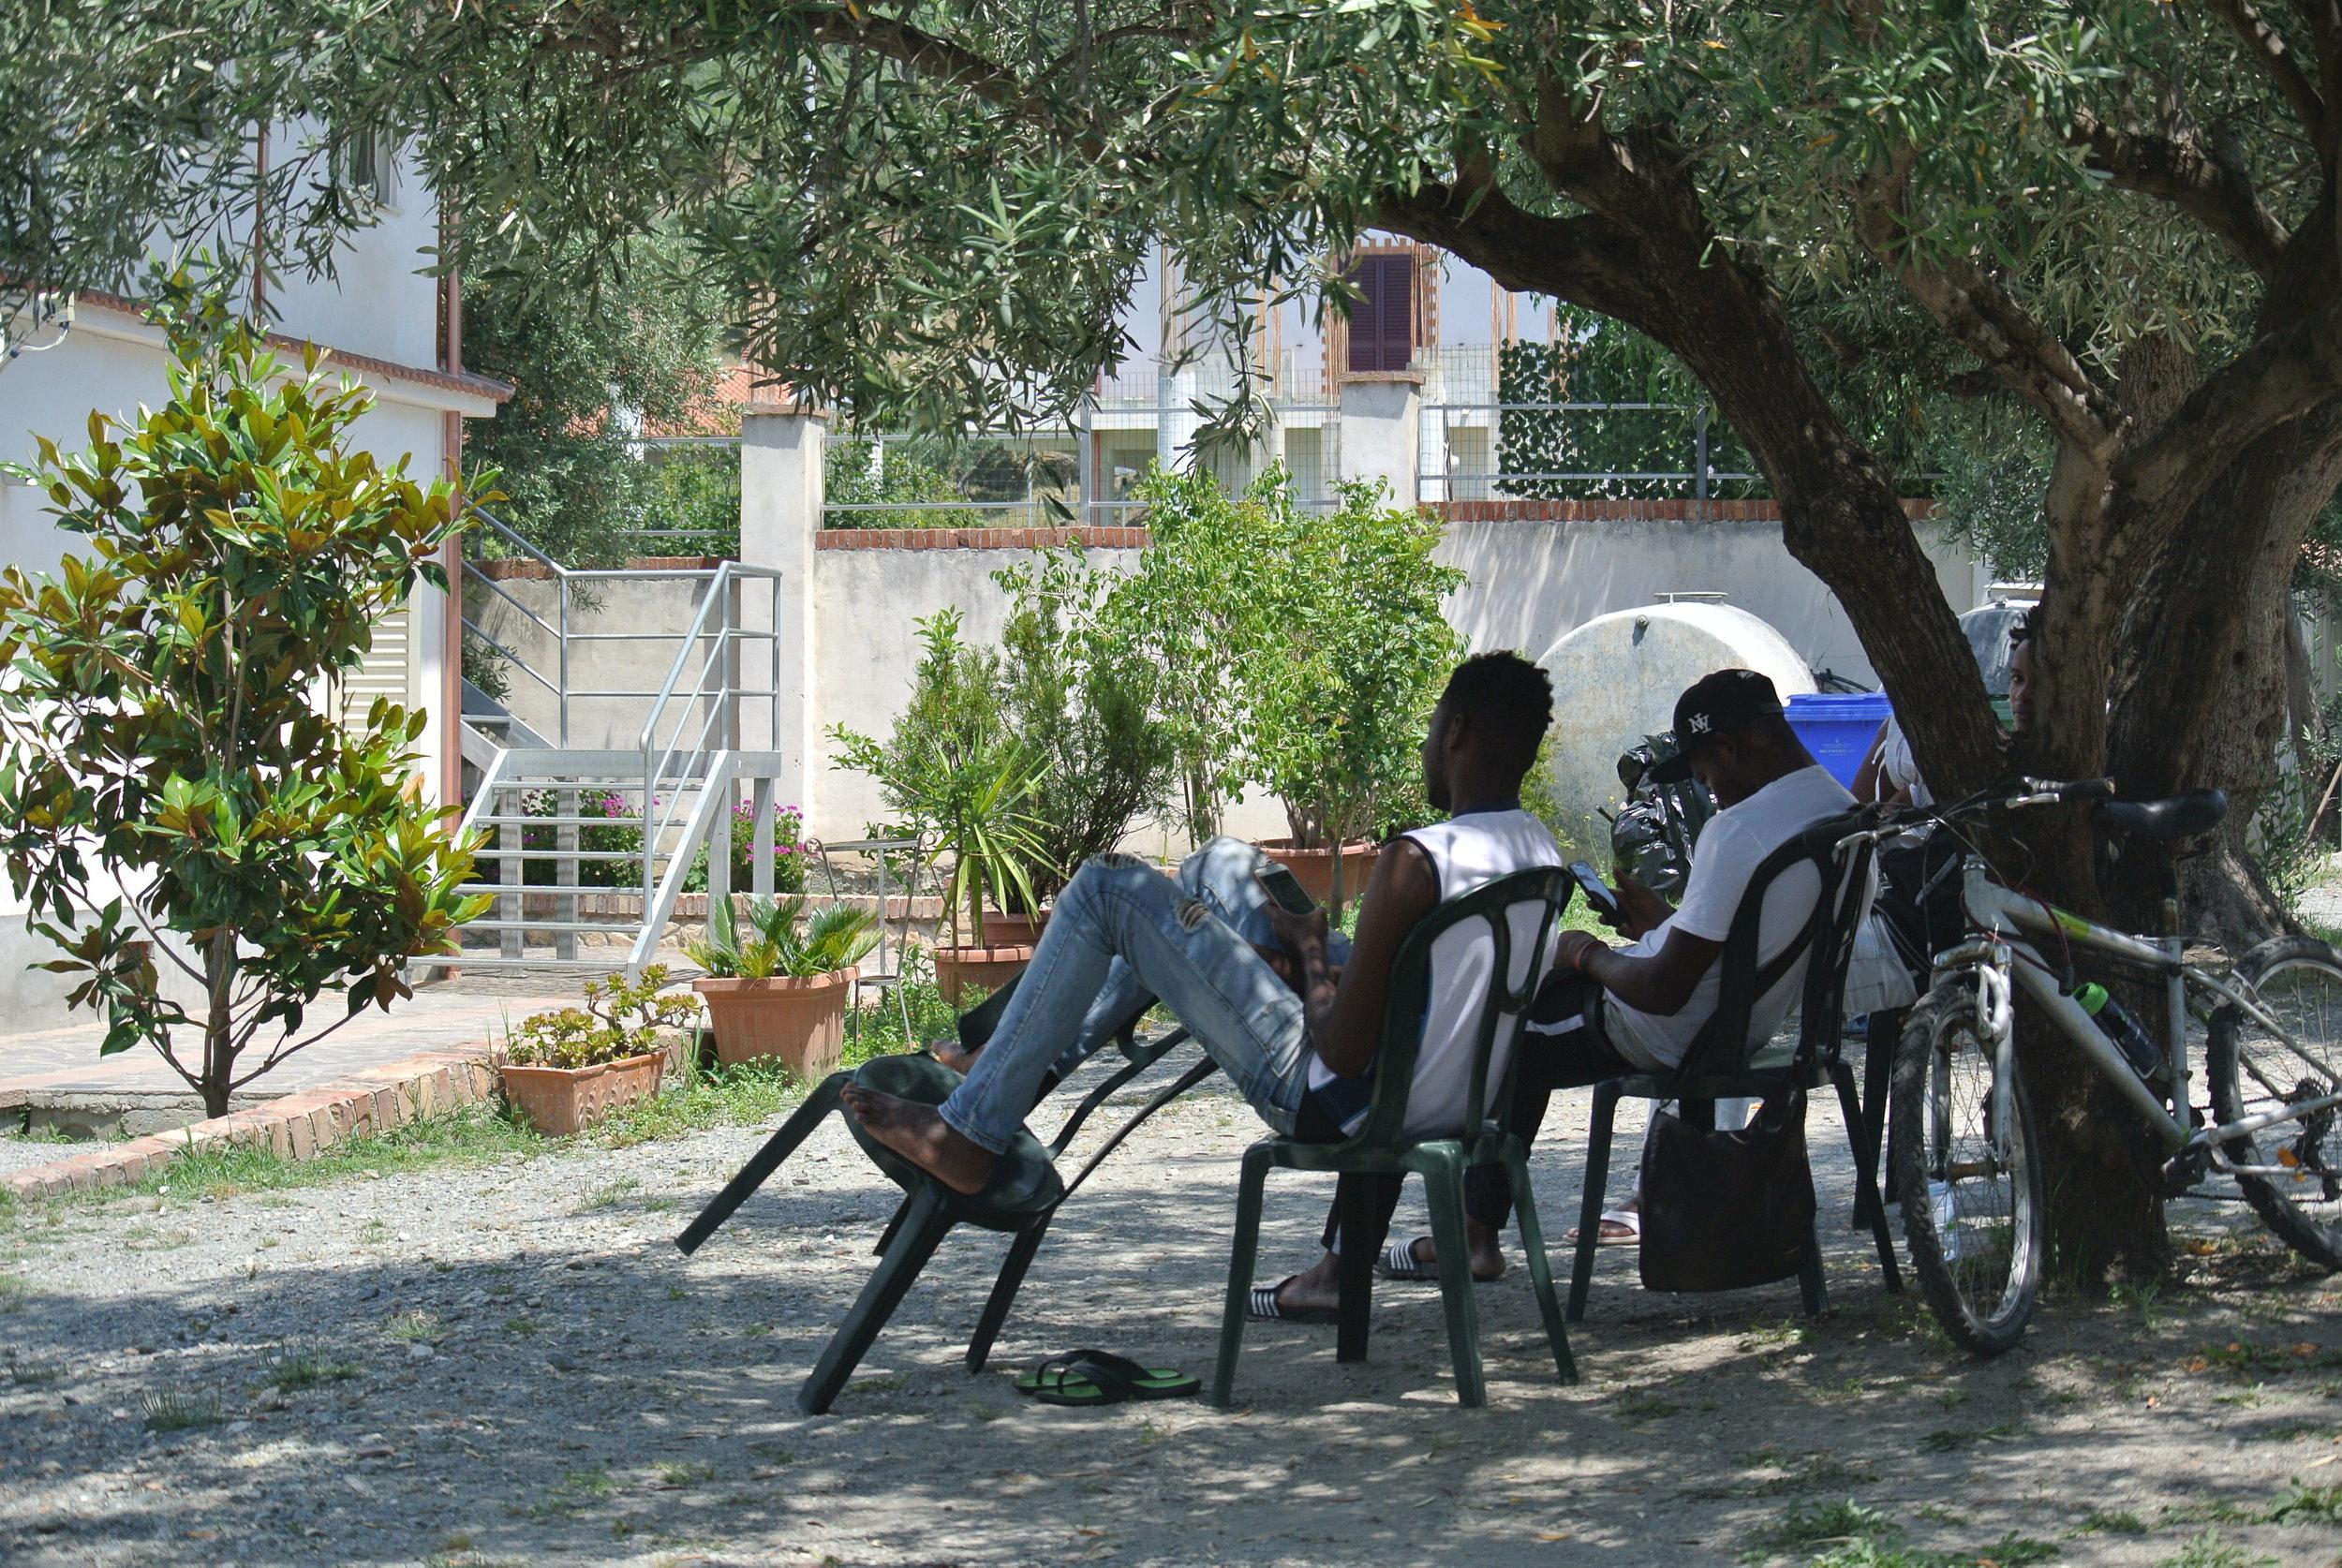 Around the housing camp. Longobardi, Italy; 30 May 2018. ©Pamela Kerpius